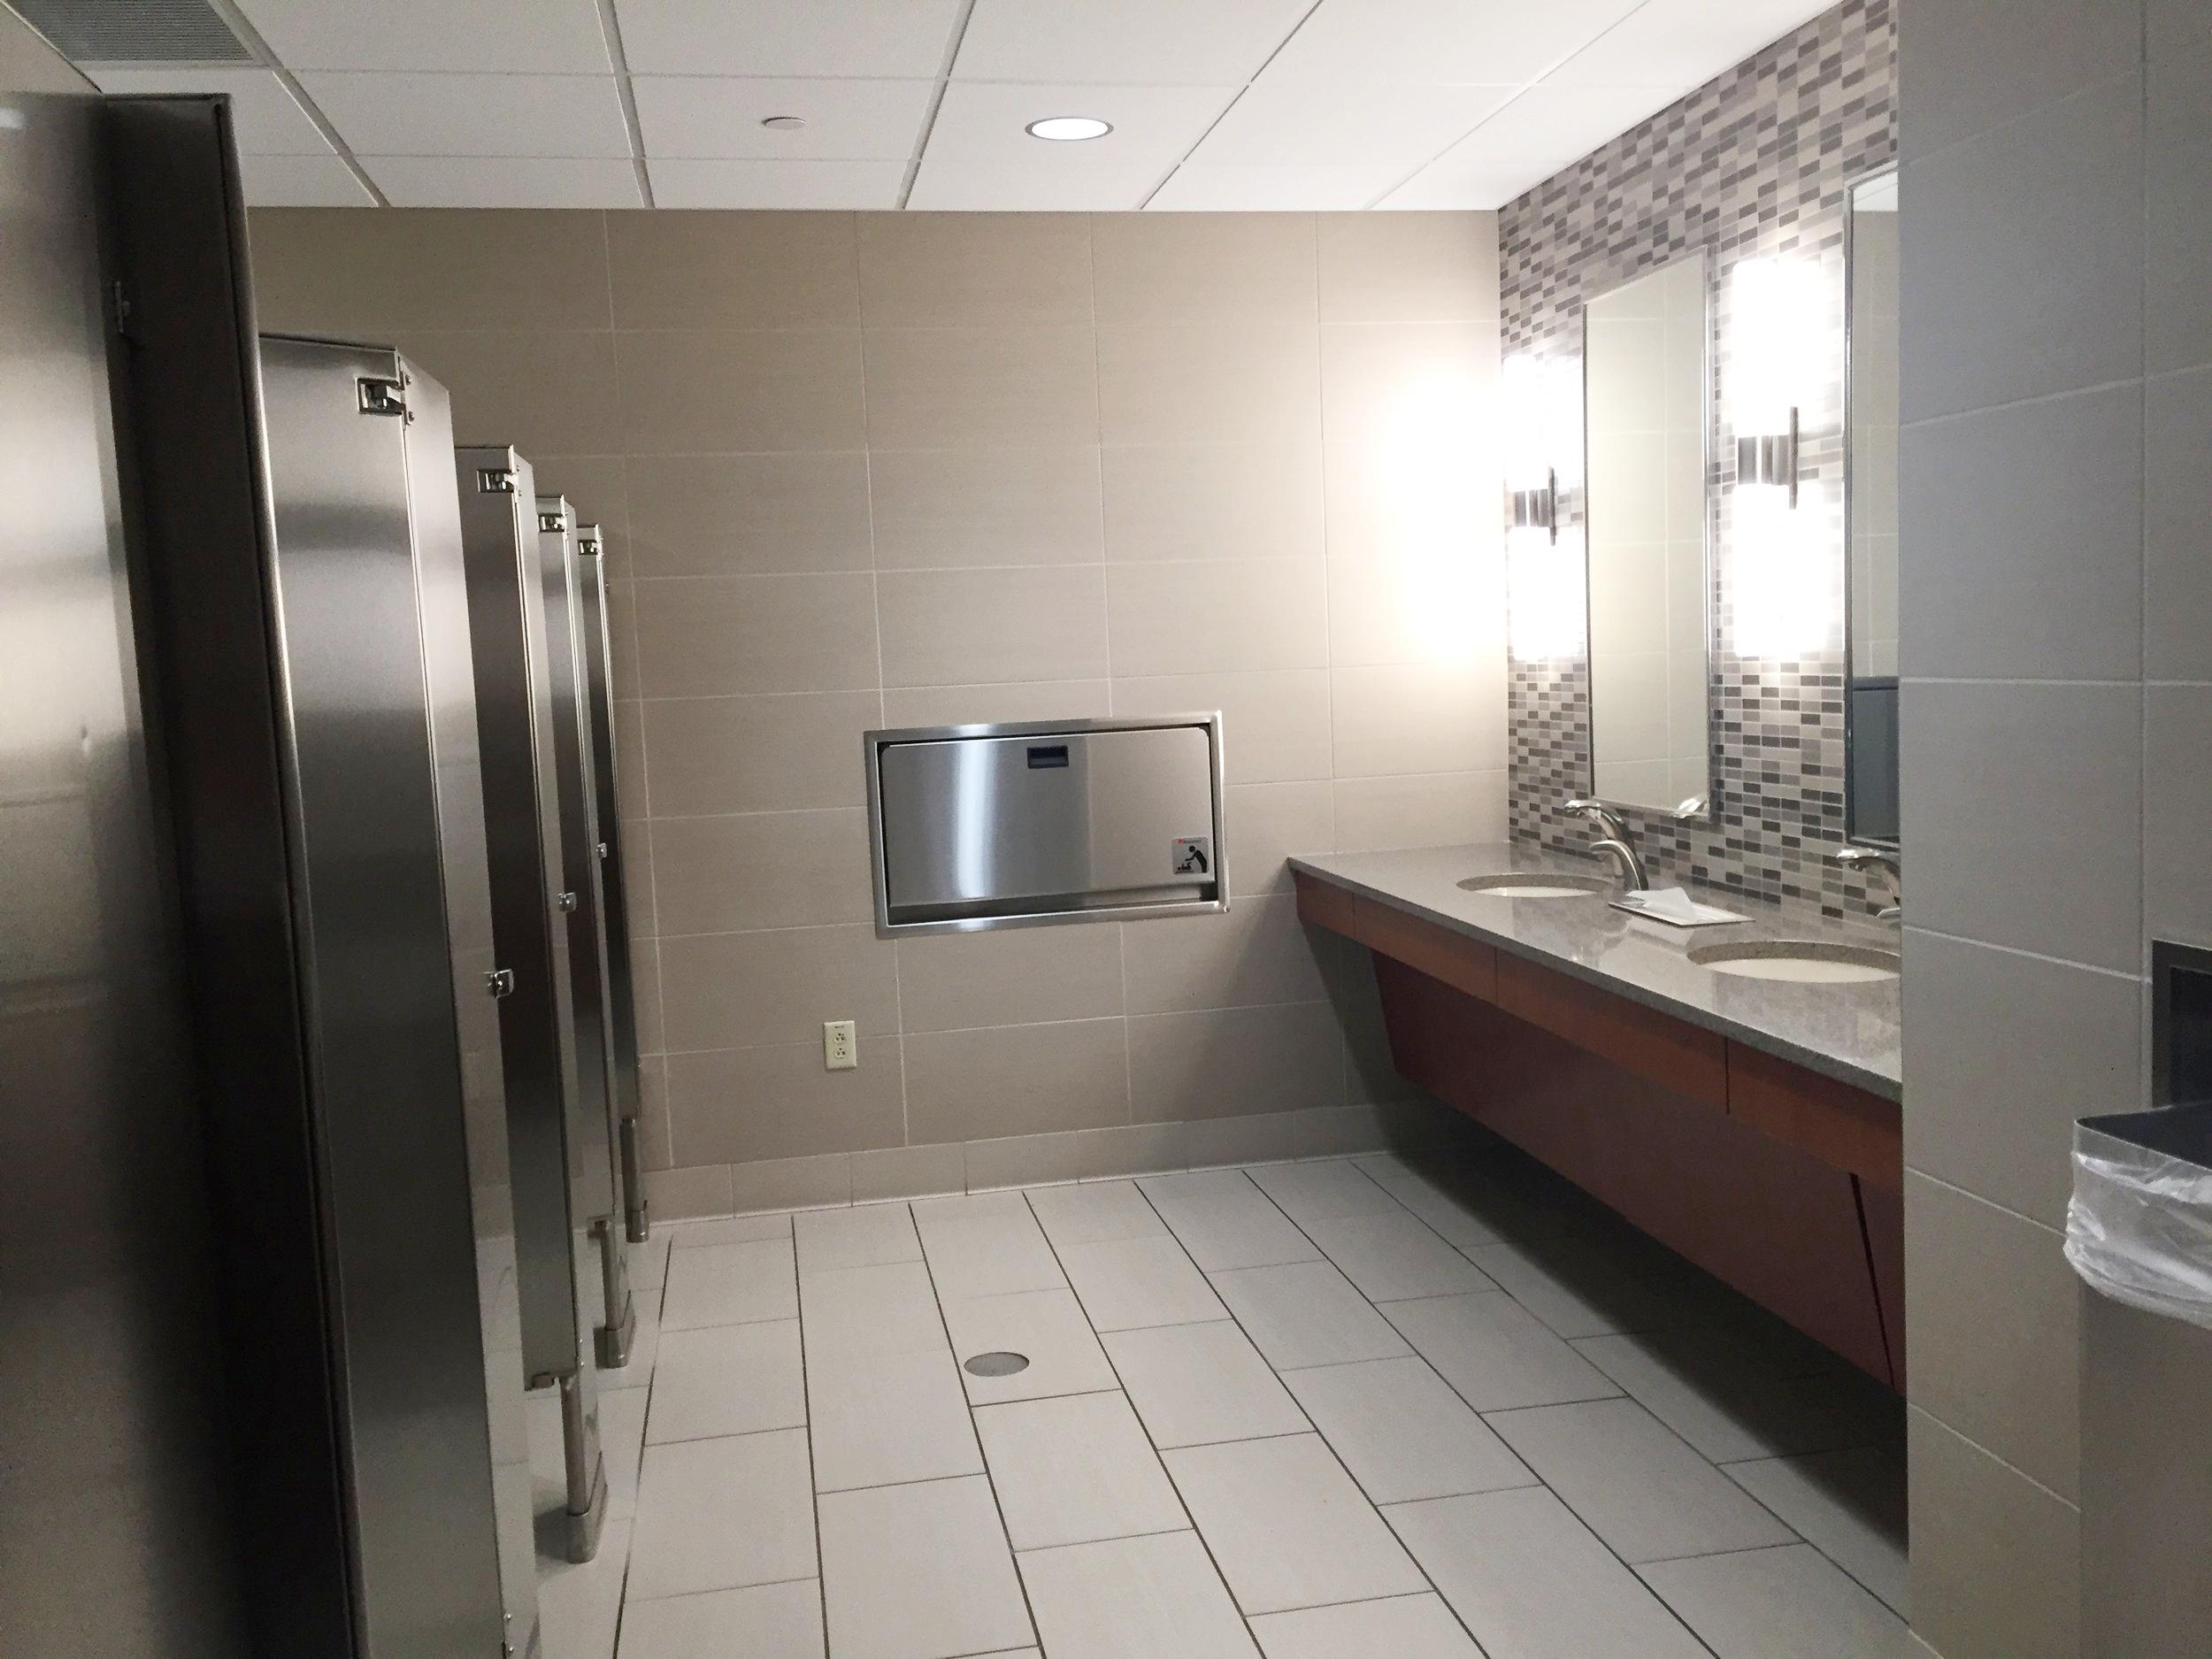 Common Area Restroom Renovation   2015